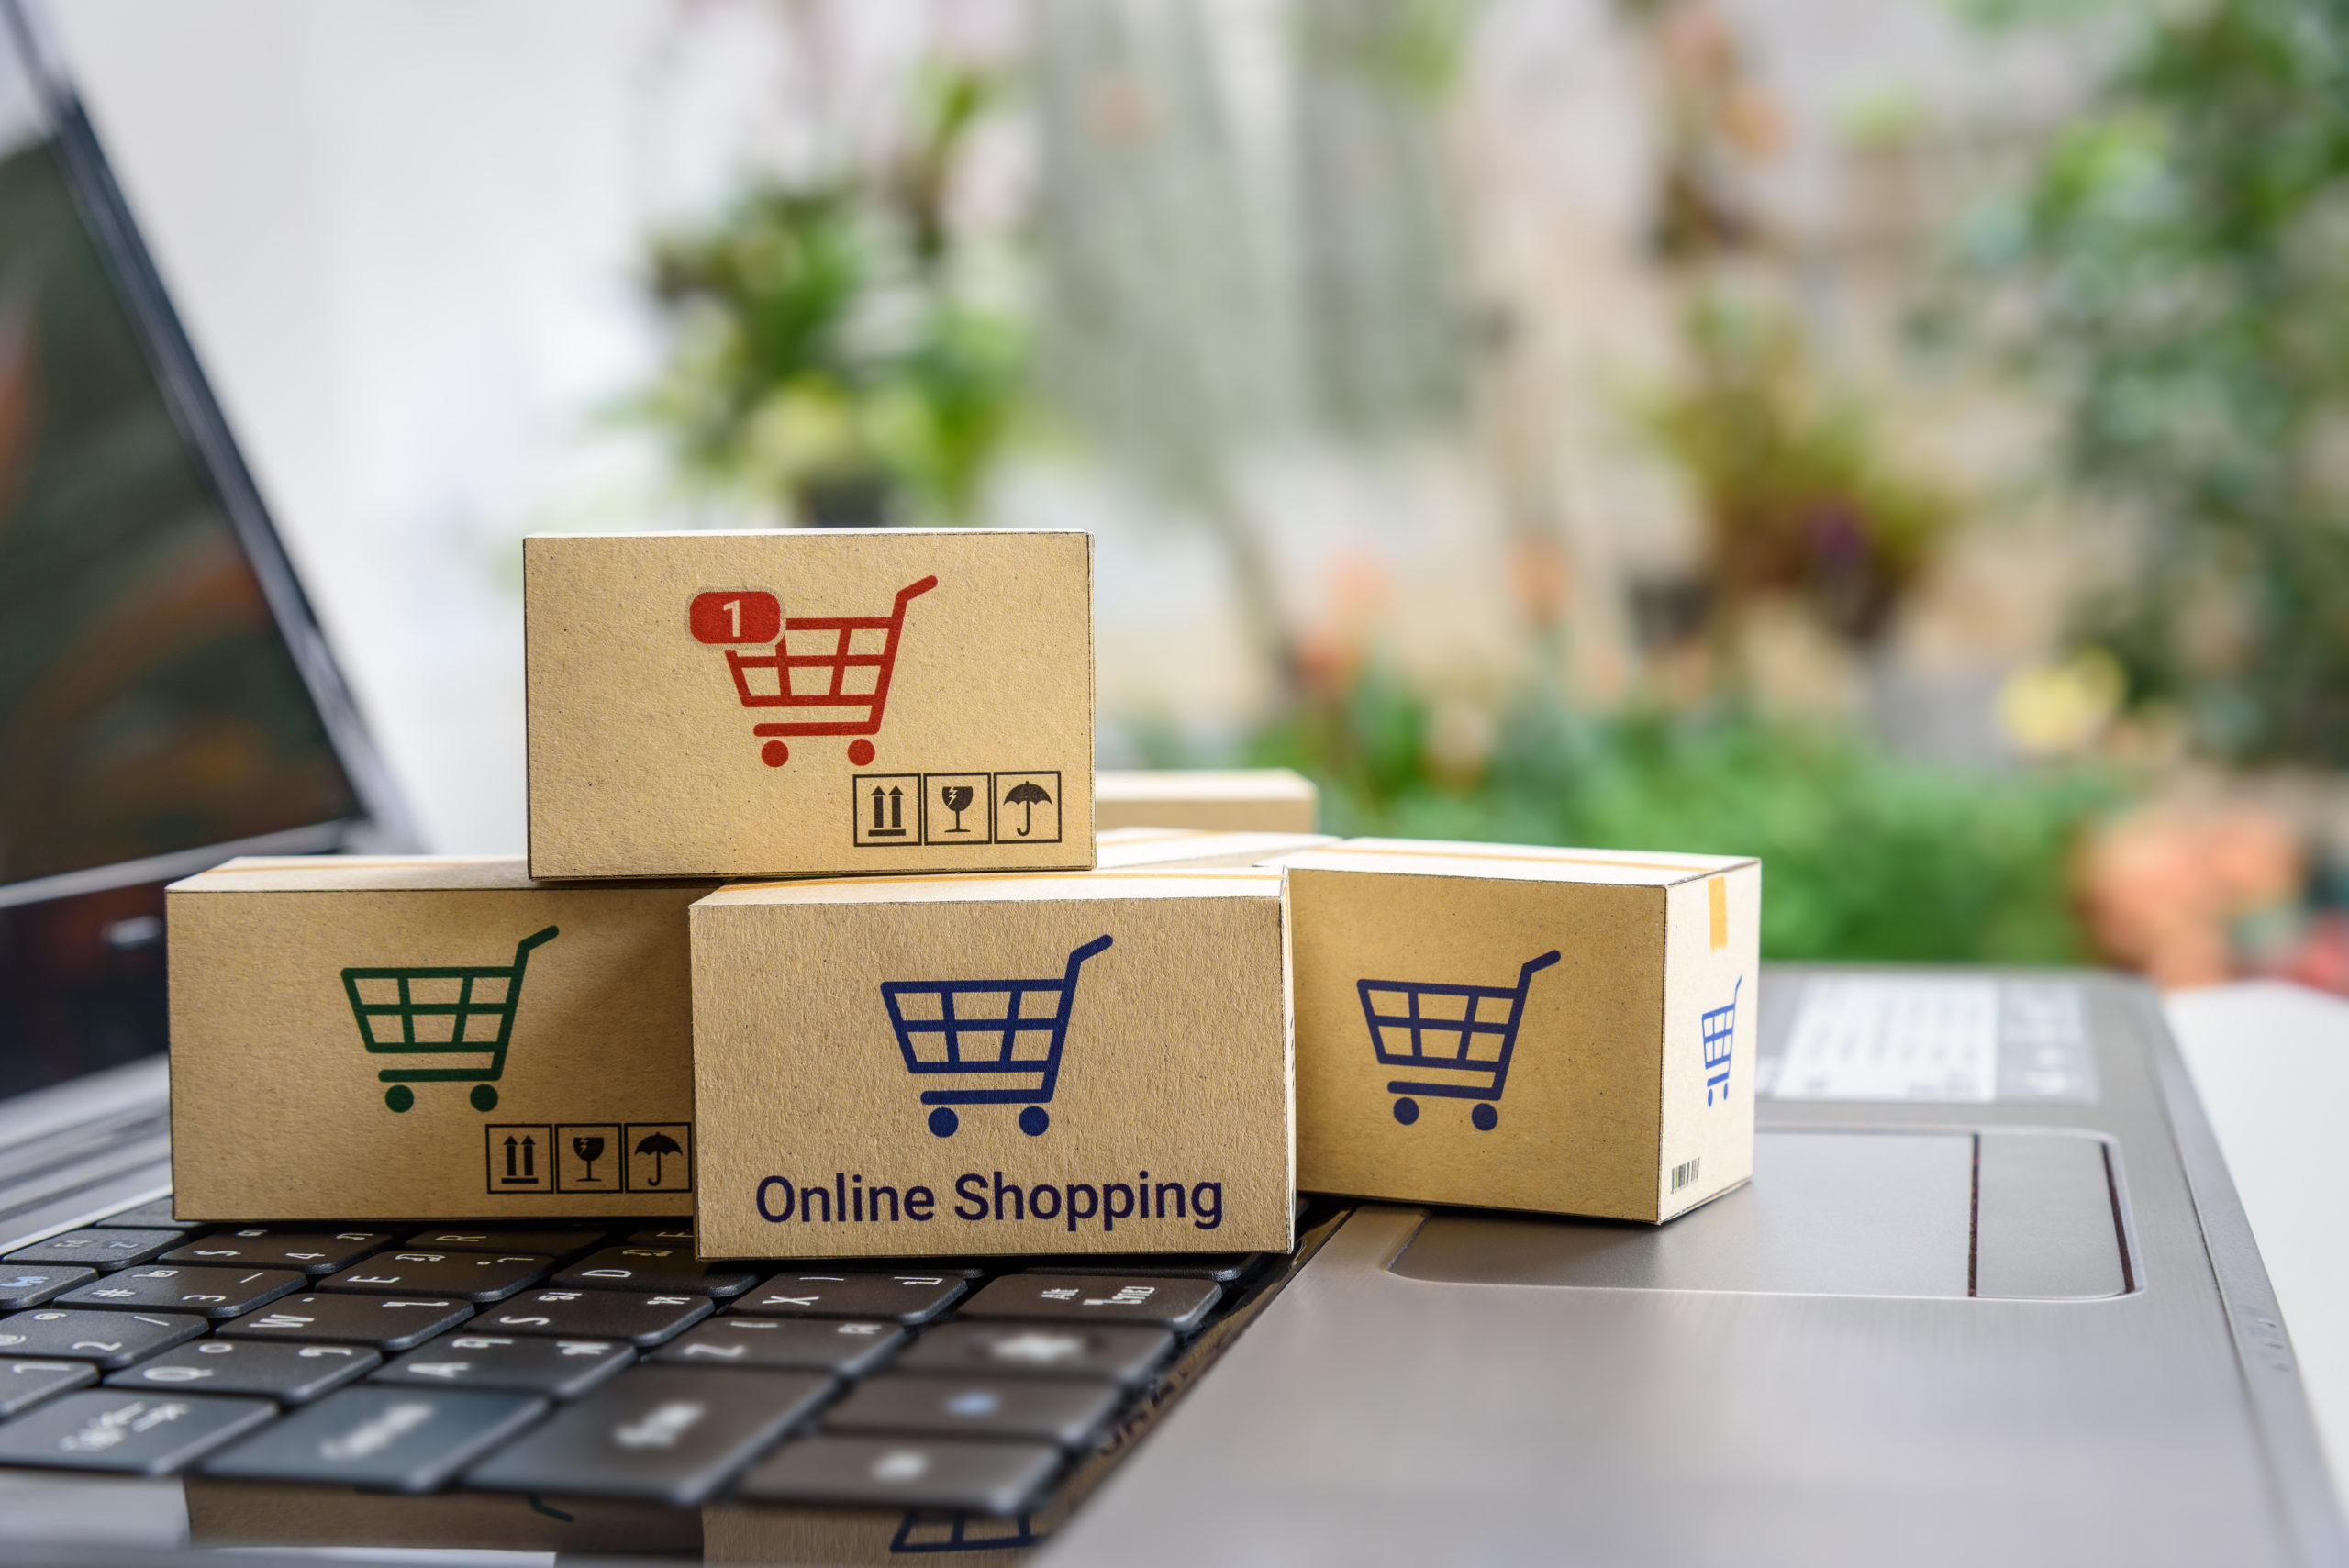 Online,Shopping